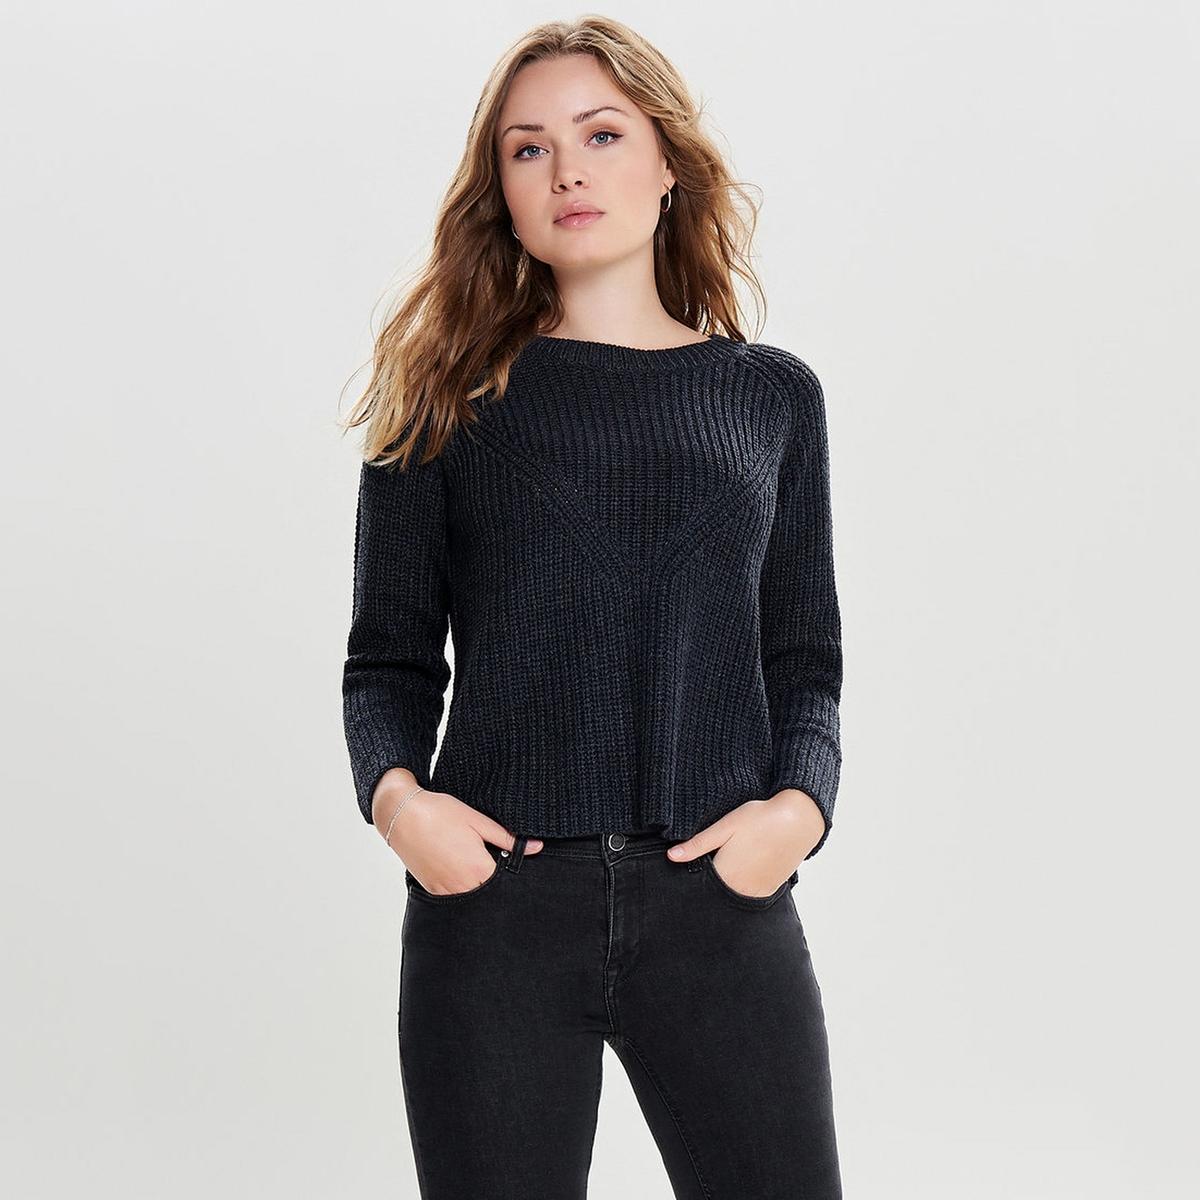 Пуловер La Redoute С круглым вырезом из плотного трикотажа XS синий цена